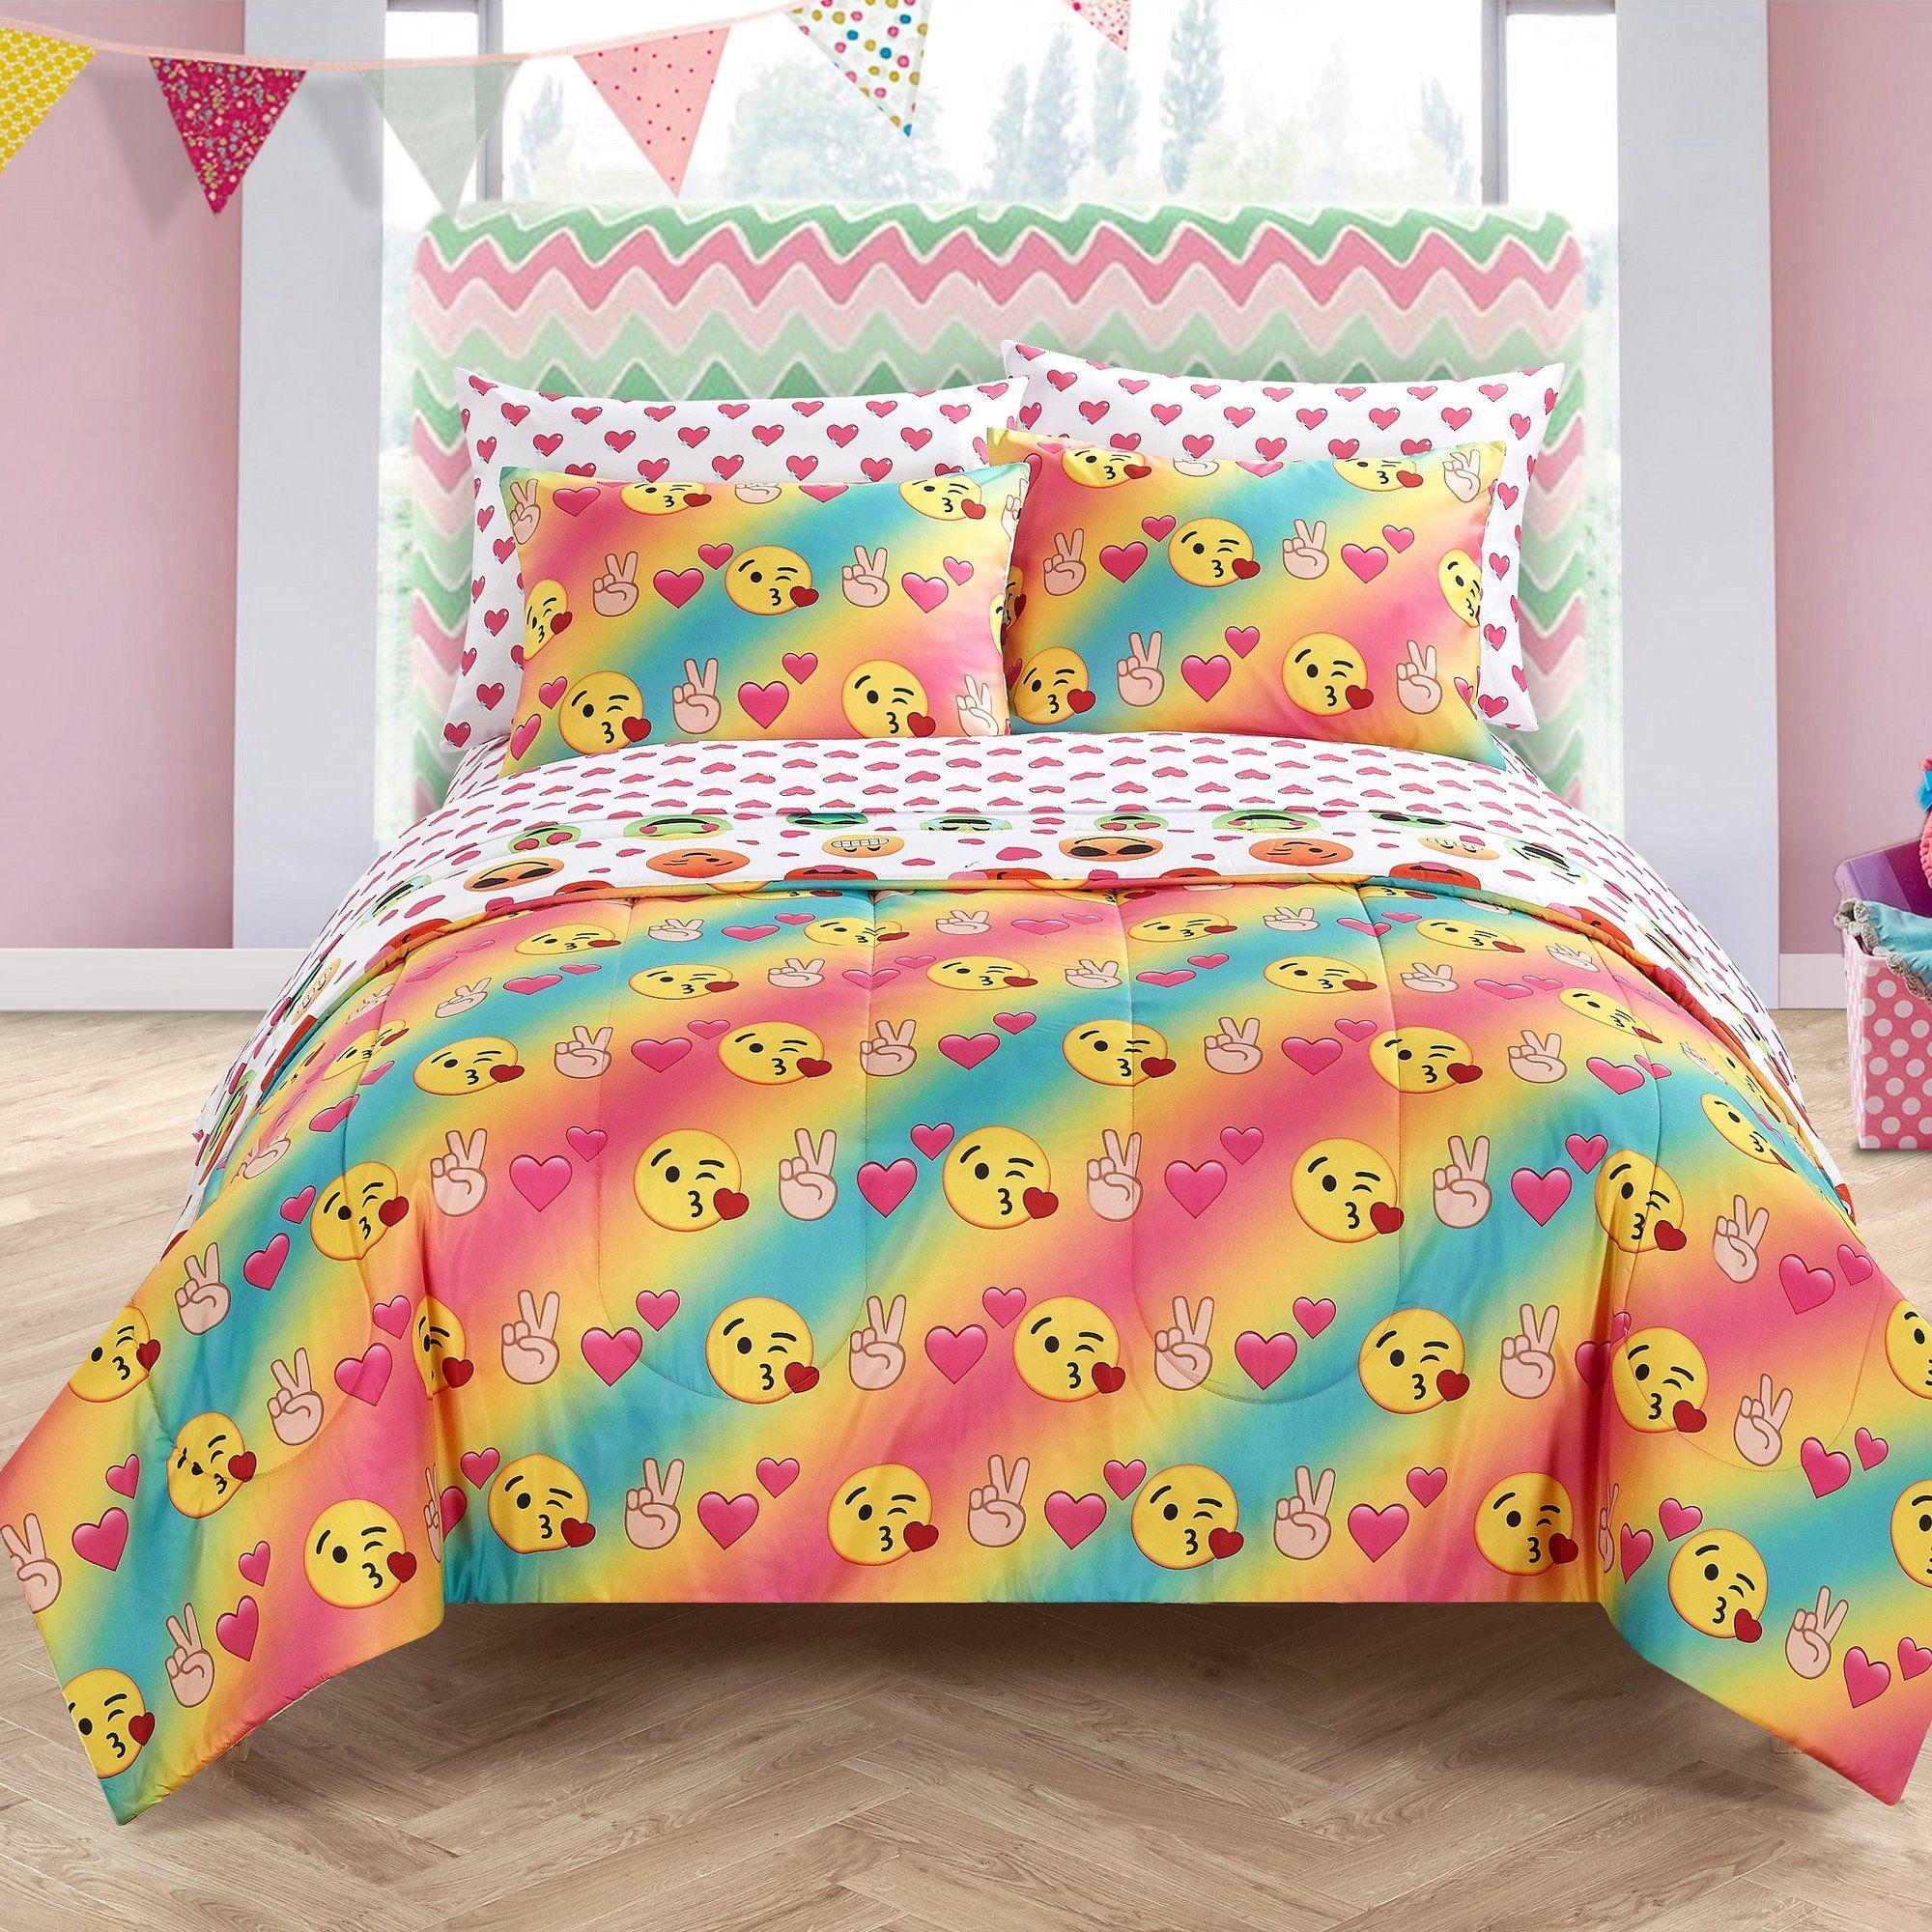 Emoji Pals Reversible Comforter Set